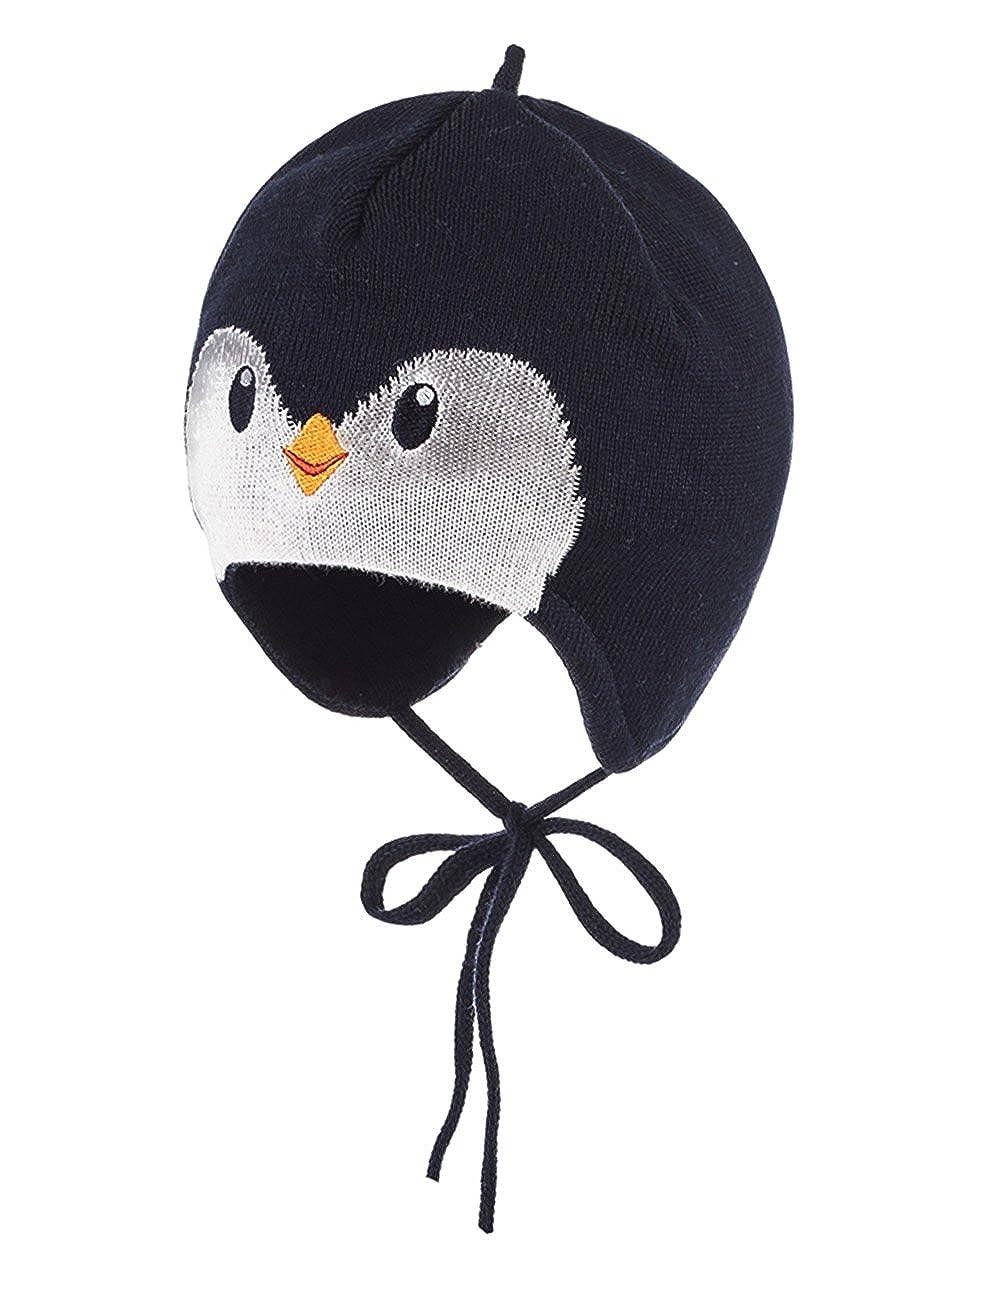 maximo Mütze Pinguin, Bindeband, Bonnet Bébé Garçon Bonnet Bébé Garçon 75571-342700